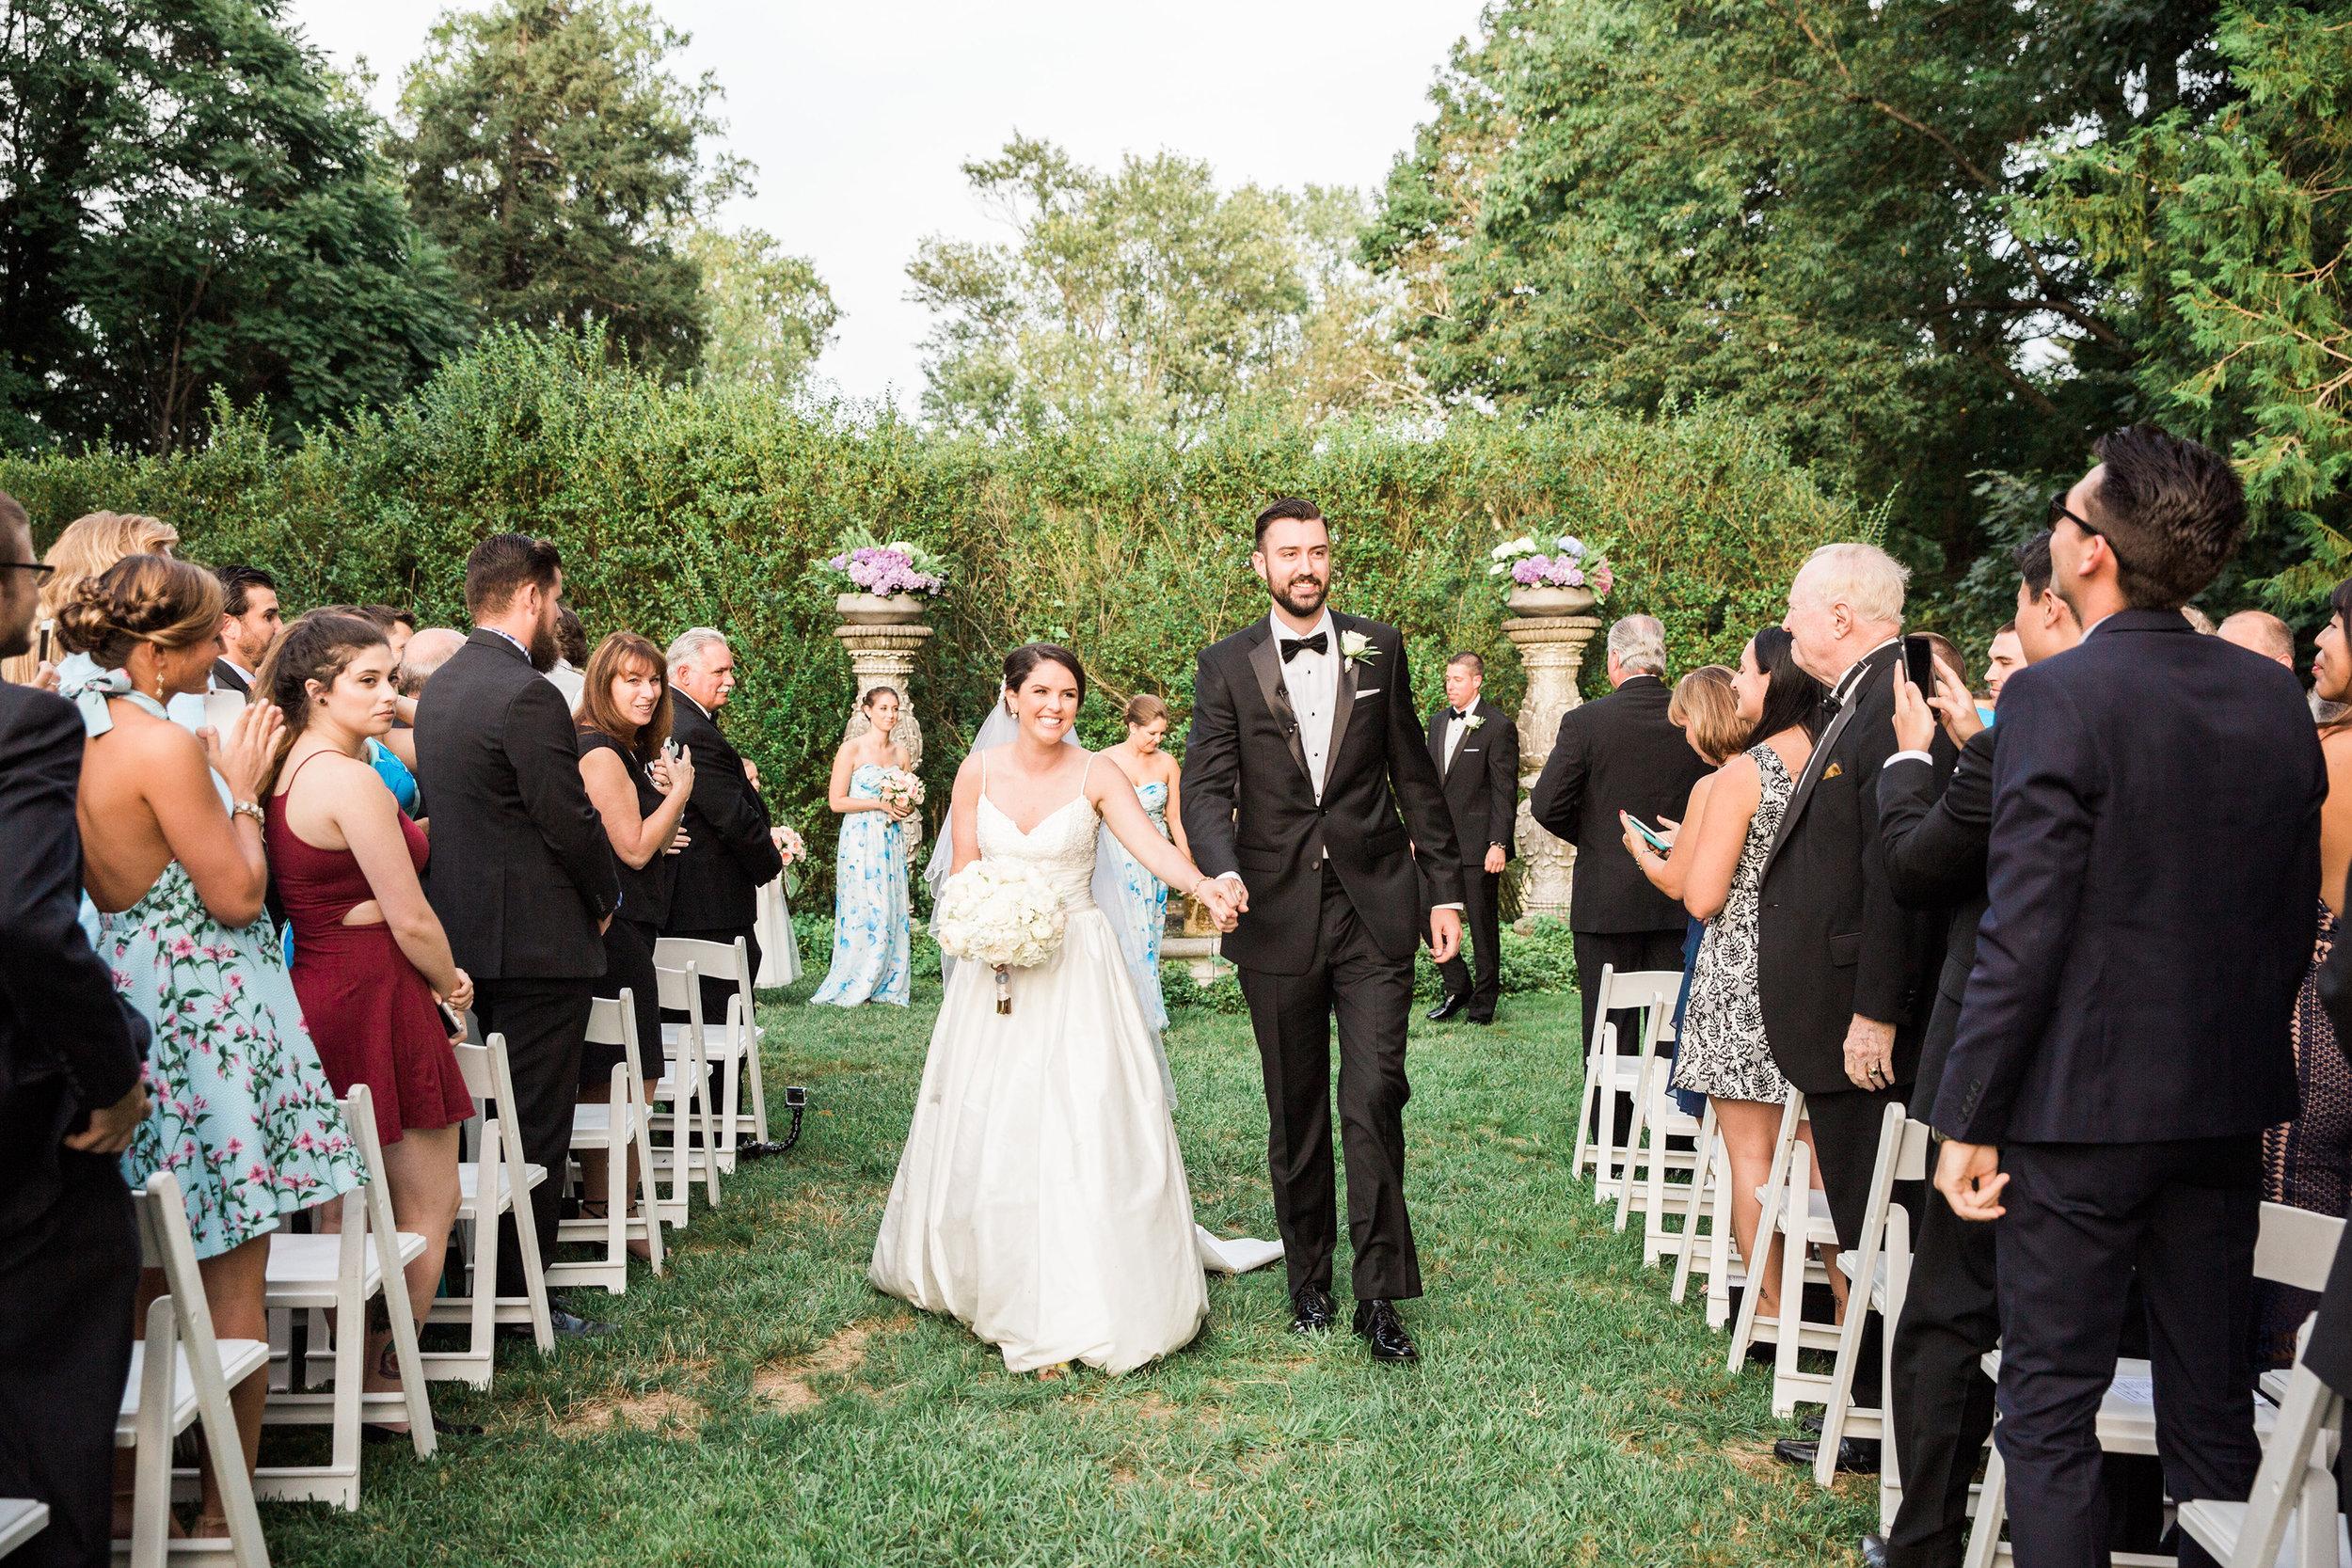 Evergreen-Museum-Balitmore-Maryland-Wedding-Black-Tie-Bride-032.jpg